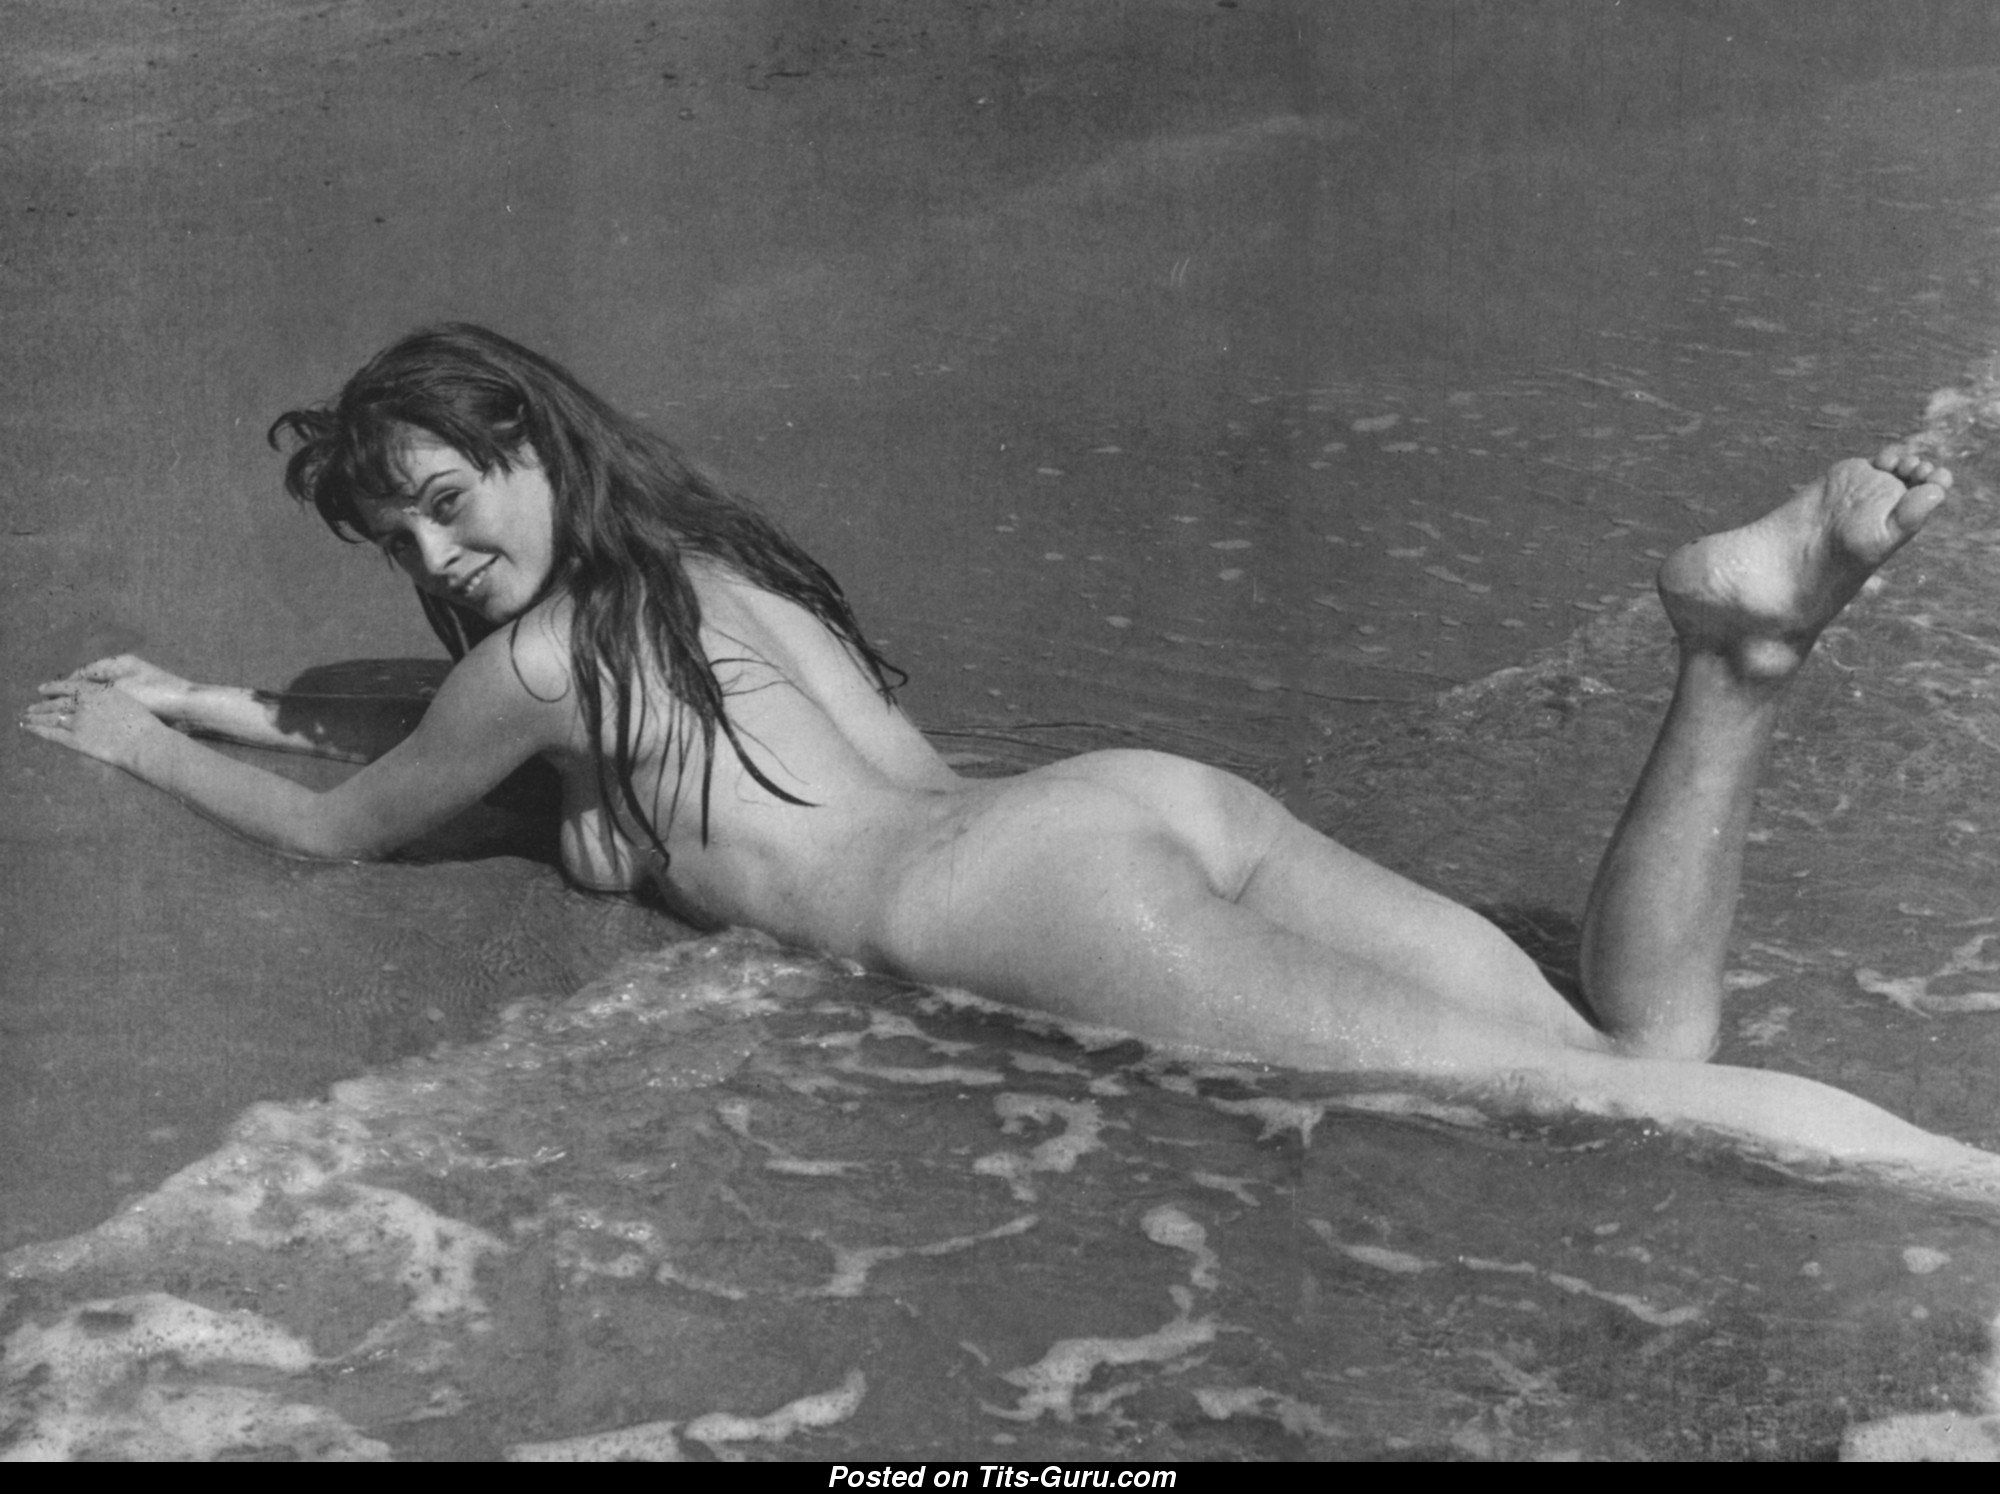 brigitte bardot sexy nude hot female image